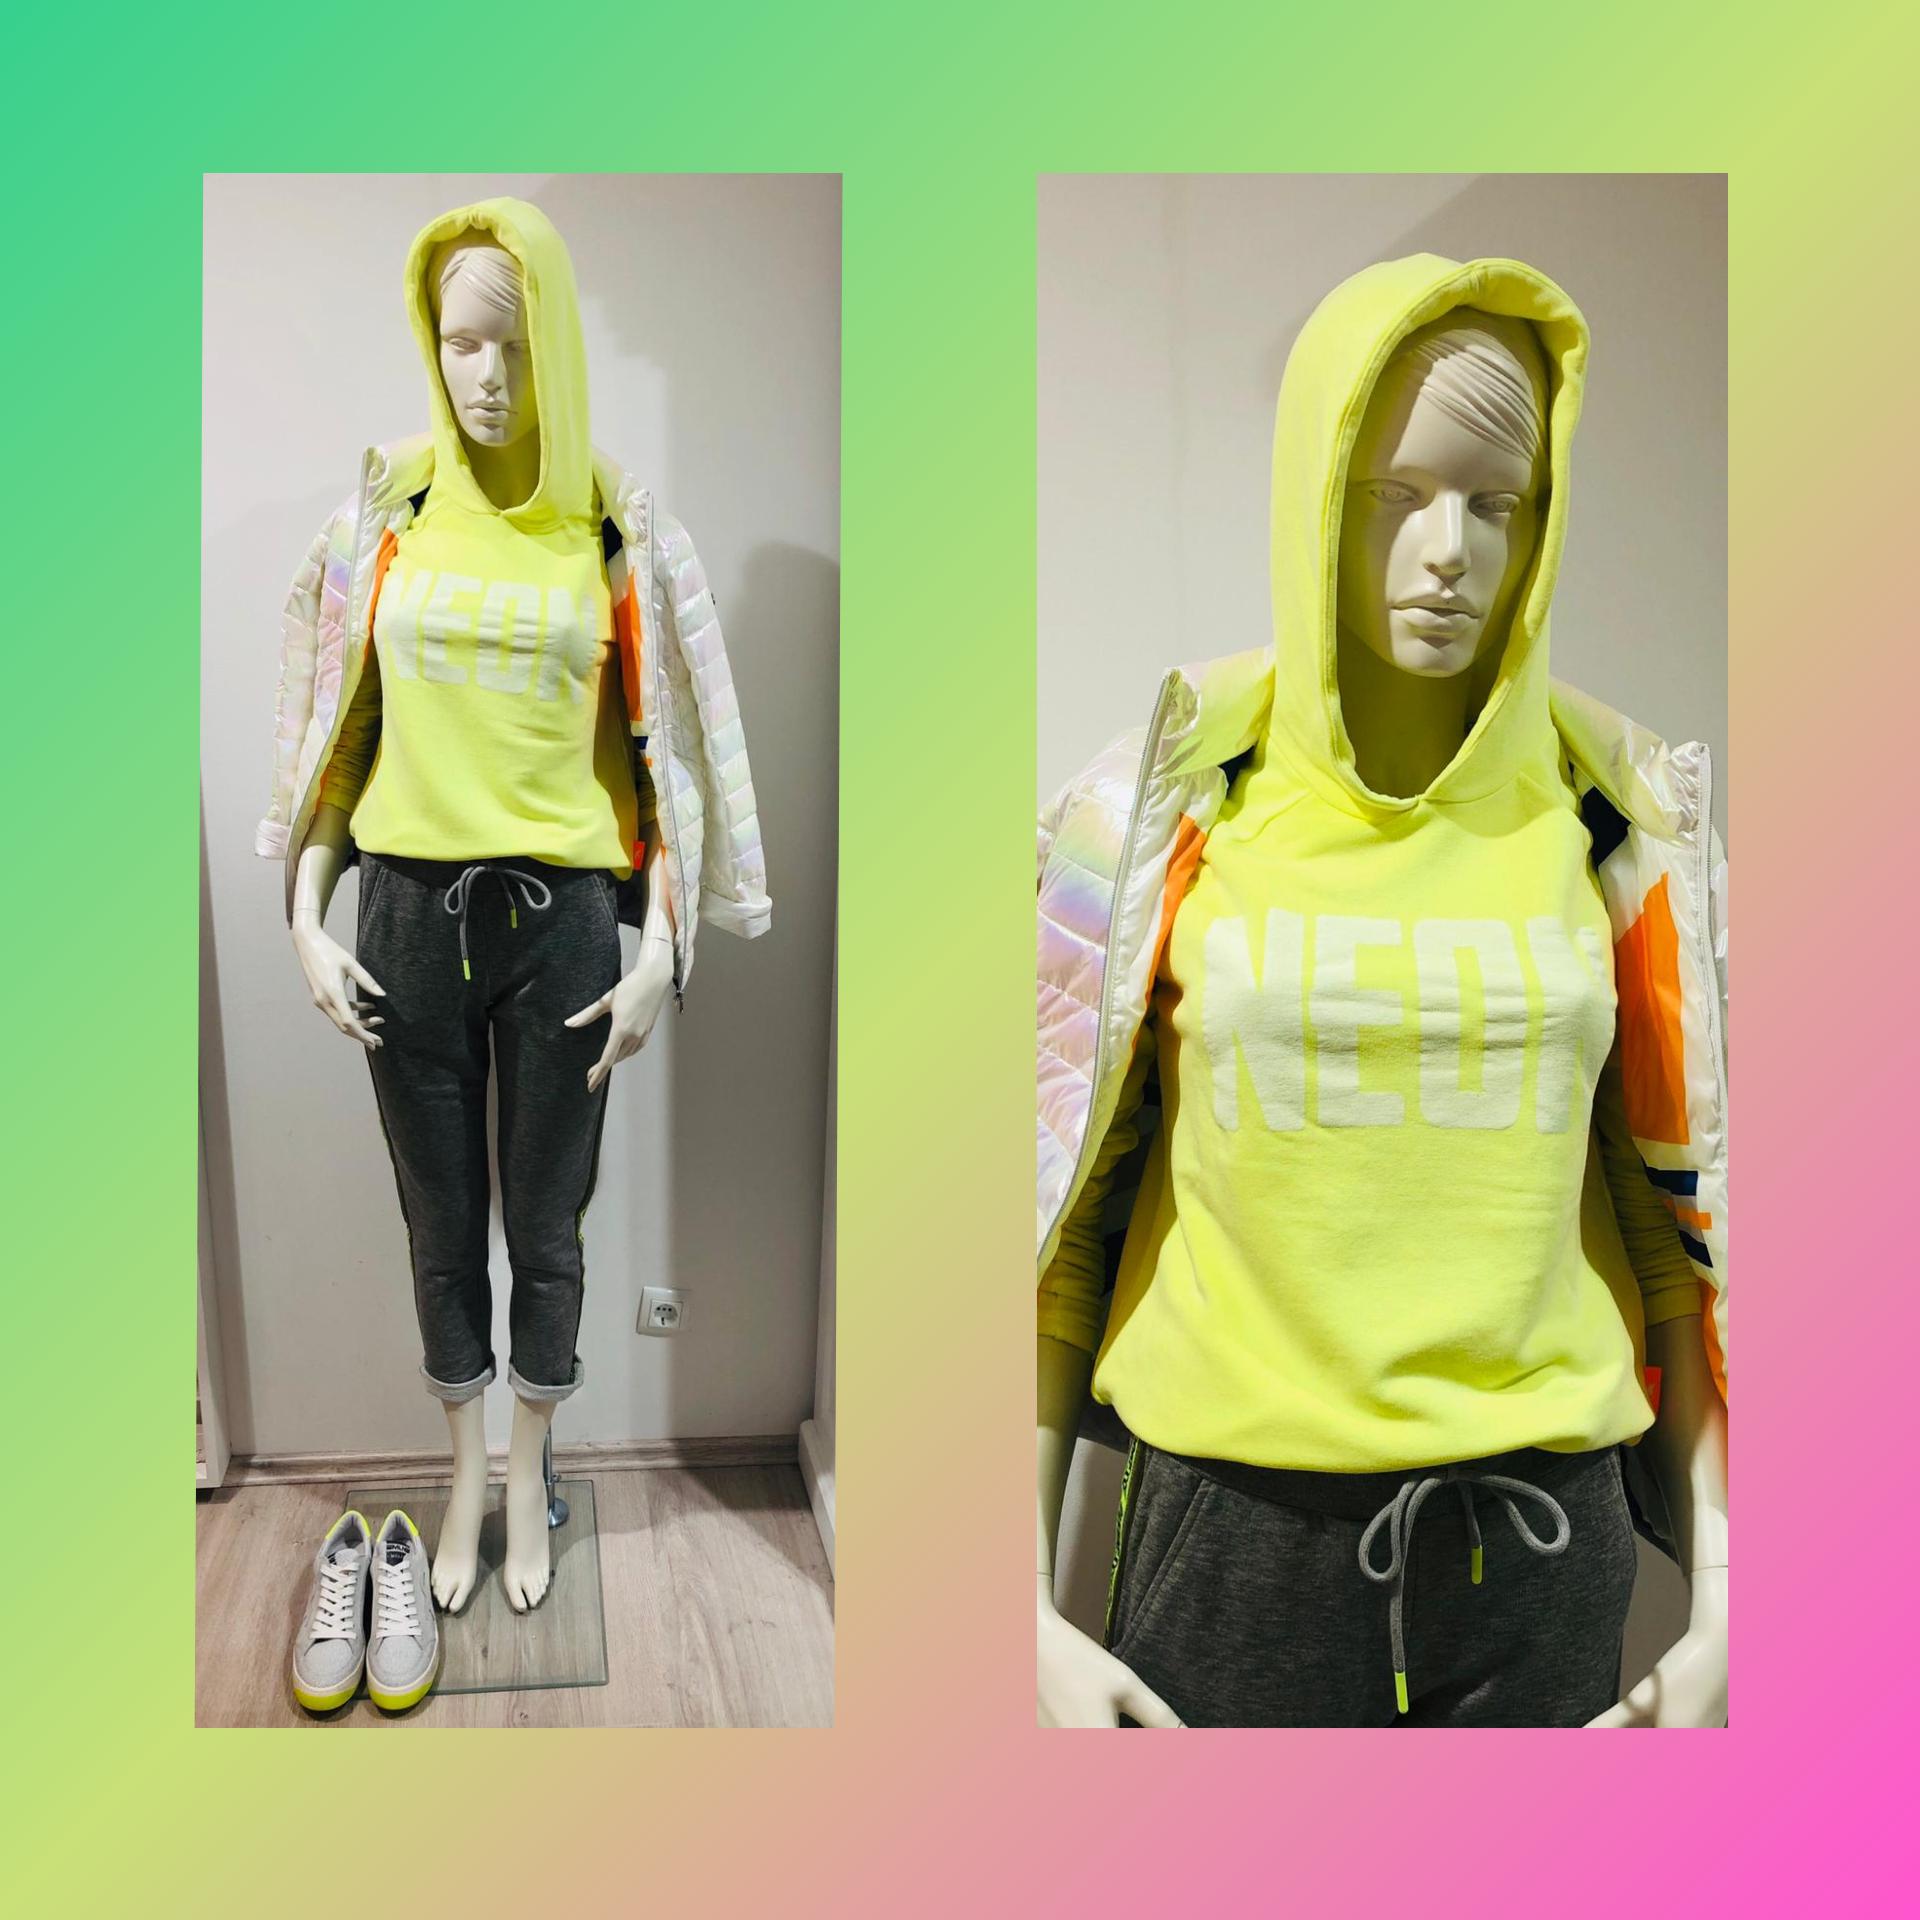 Millestone Jacke, Hoddie Emily, neon farben amling mode bad dürkheim